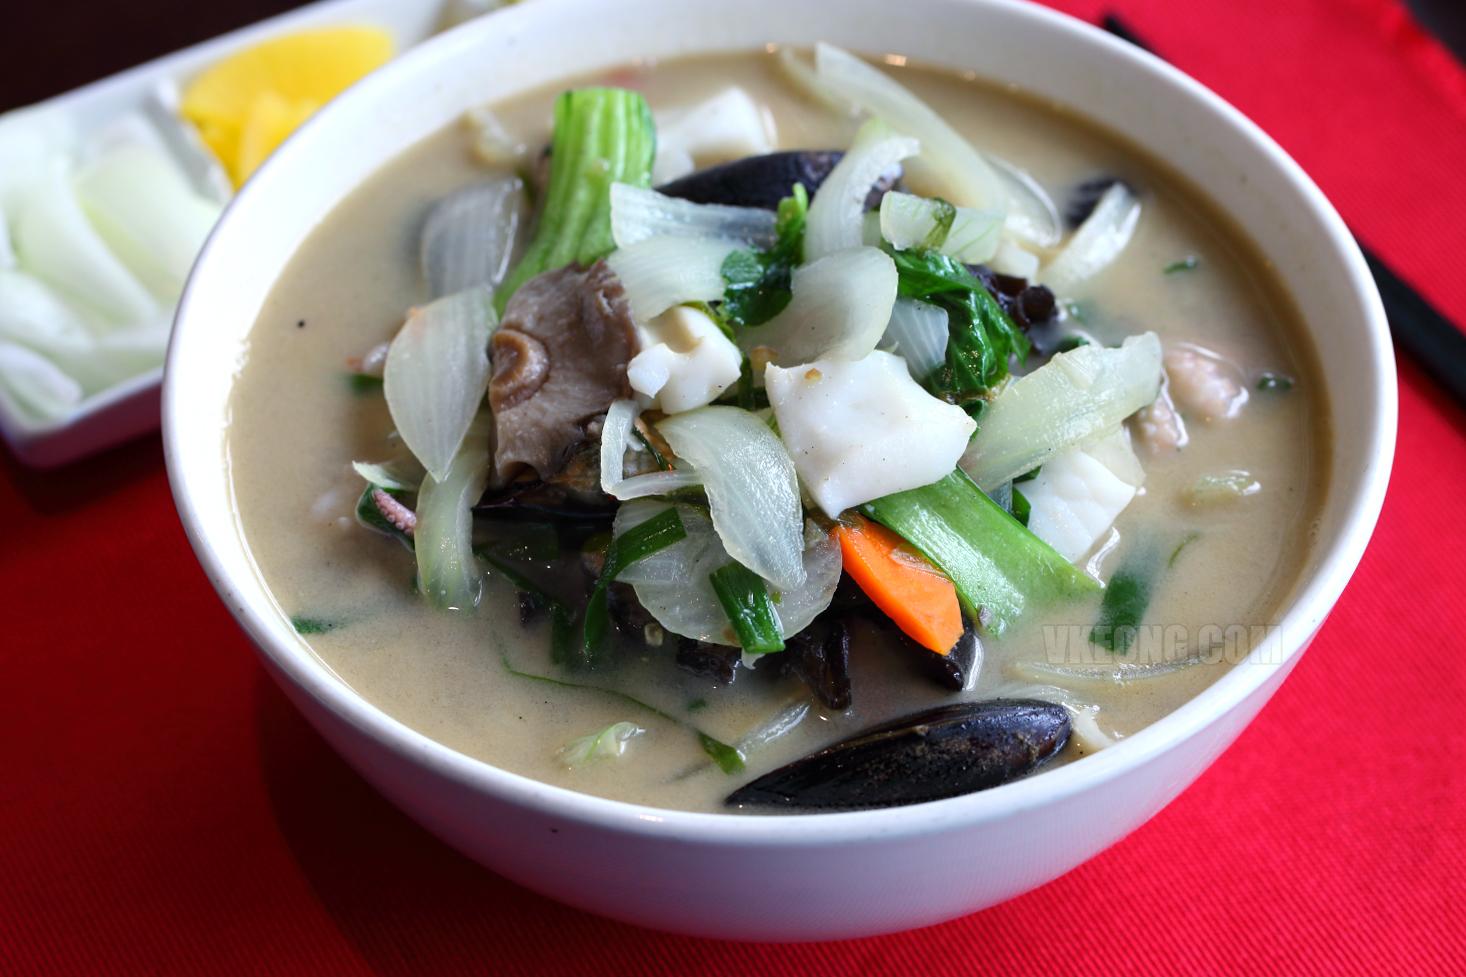 Buldojang-Nagasaki-Spicy-Seafood